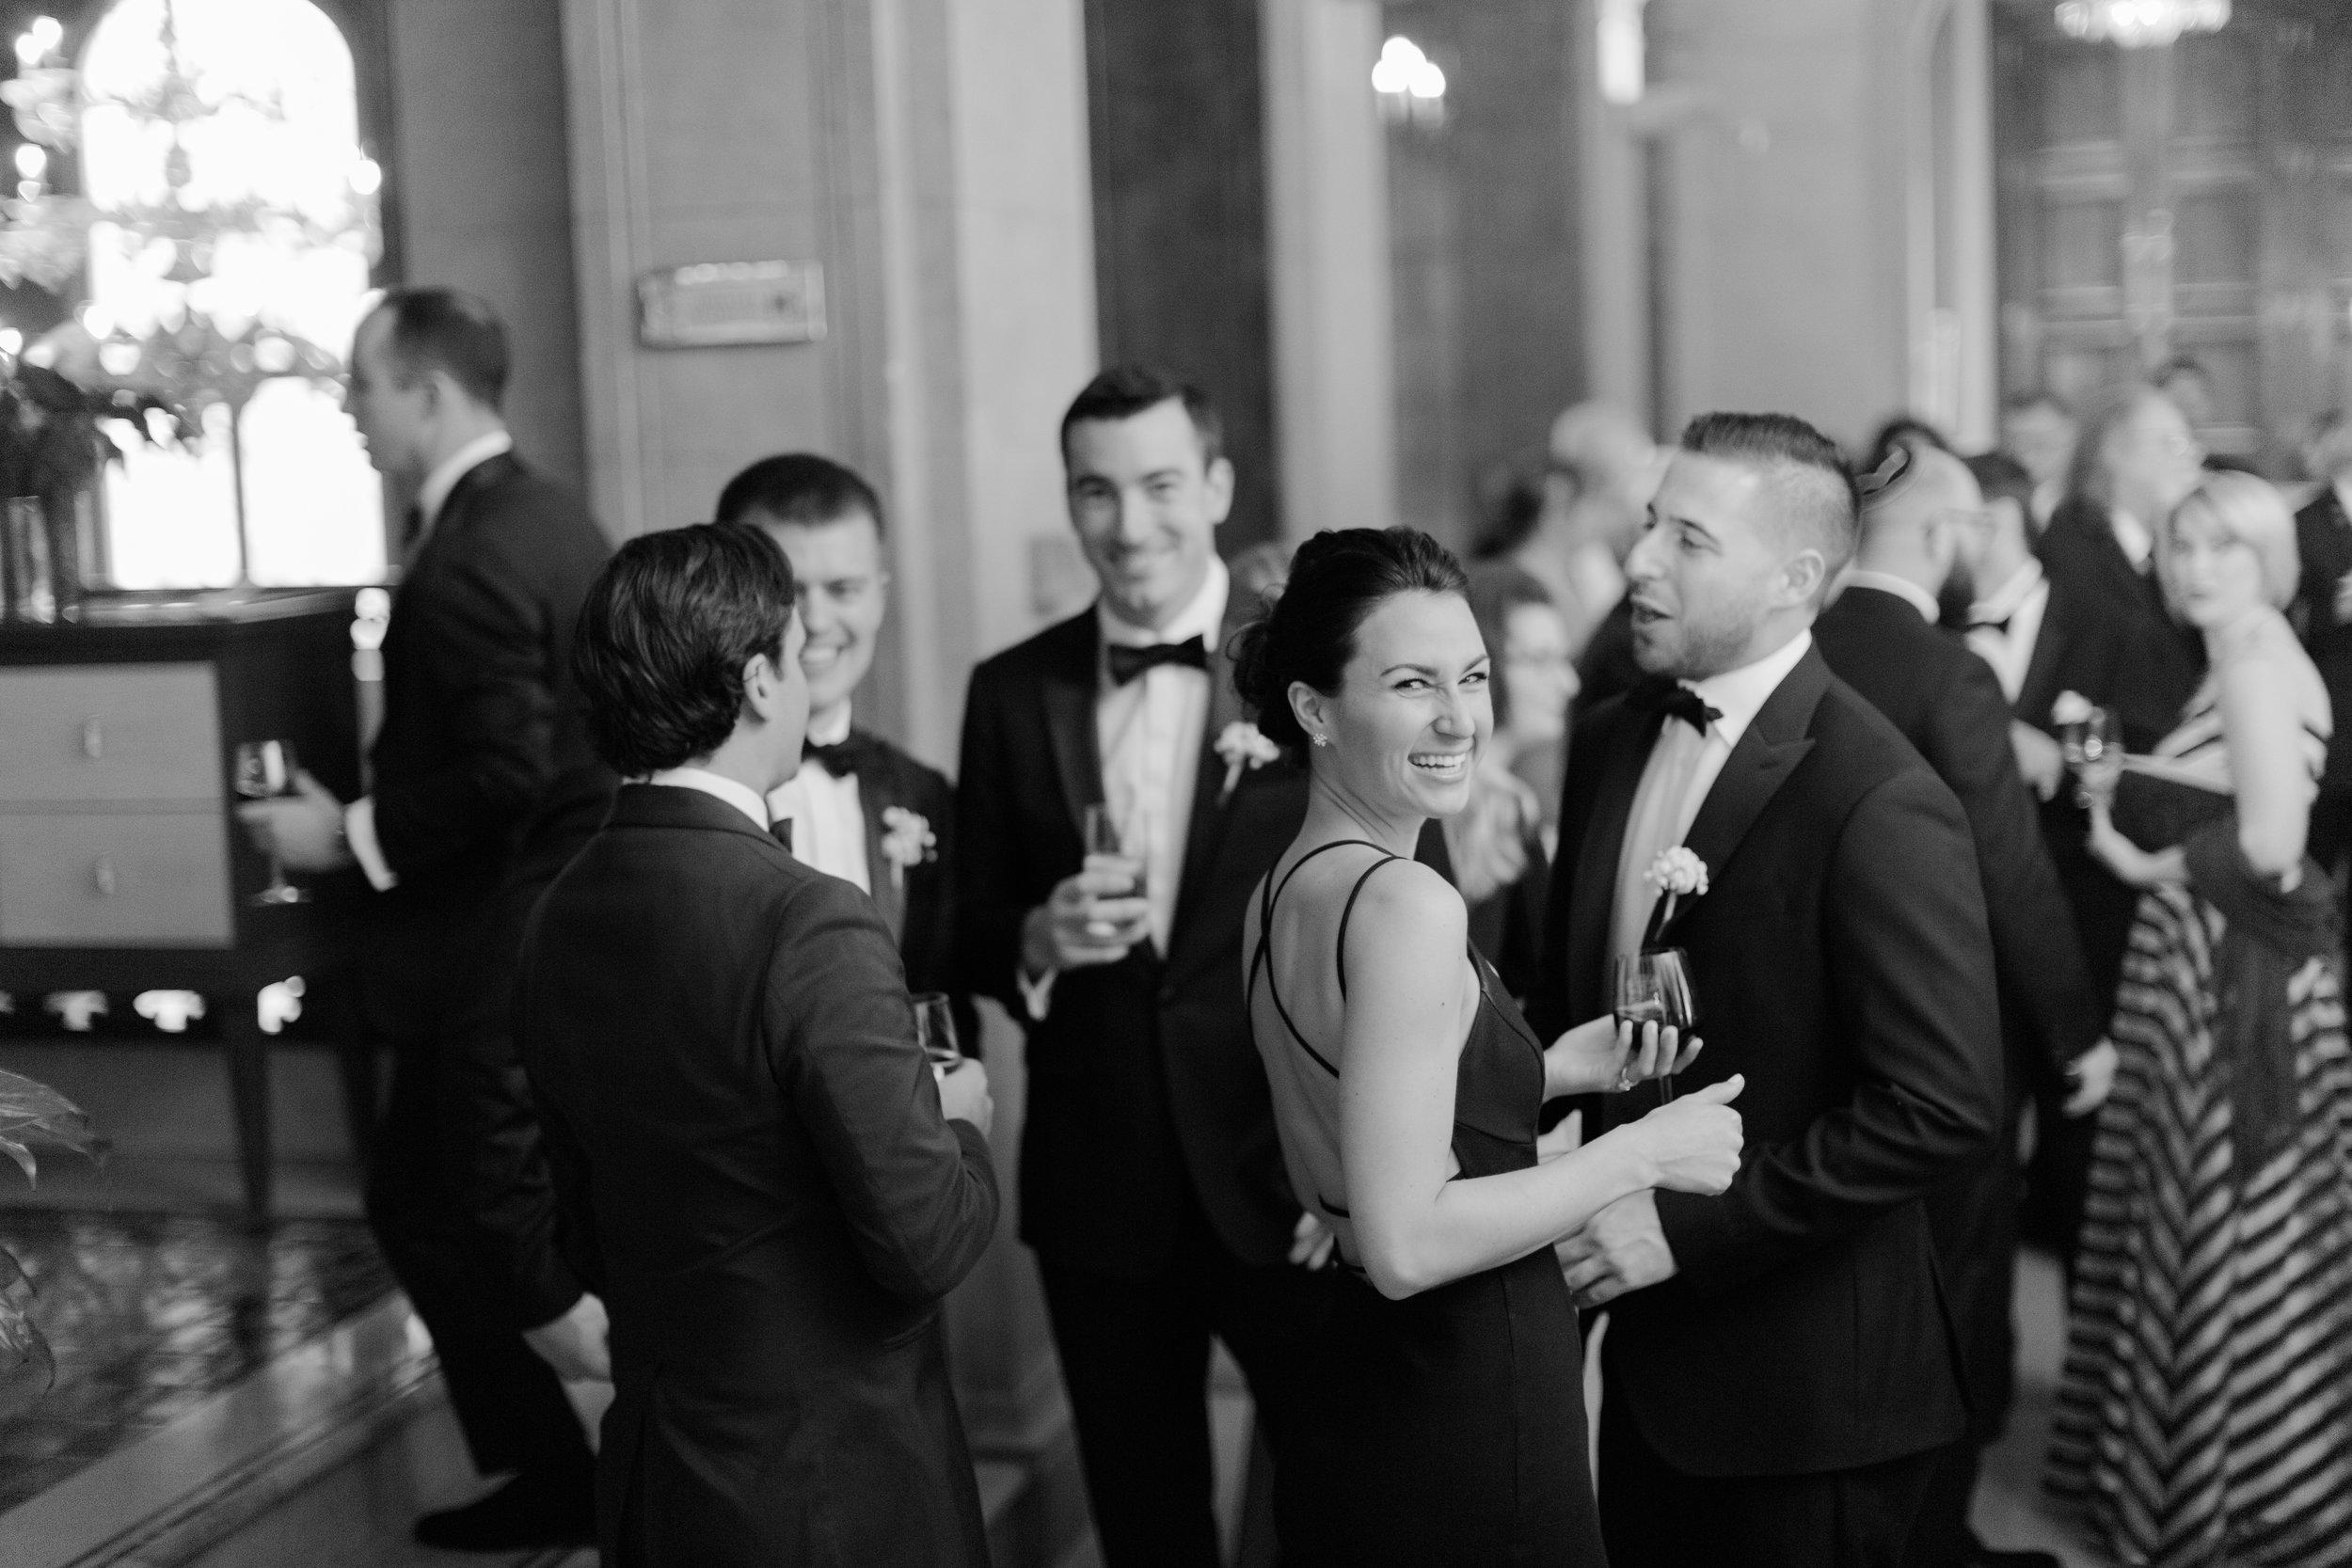 chateau-frontenac-quebec-city-best-toronto-wedding-photographer-soft-bright-pastel-richelle-hunter-elliott-heidi-639.jpg